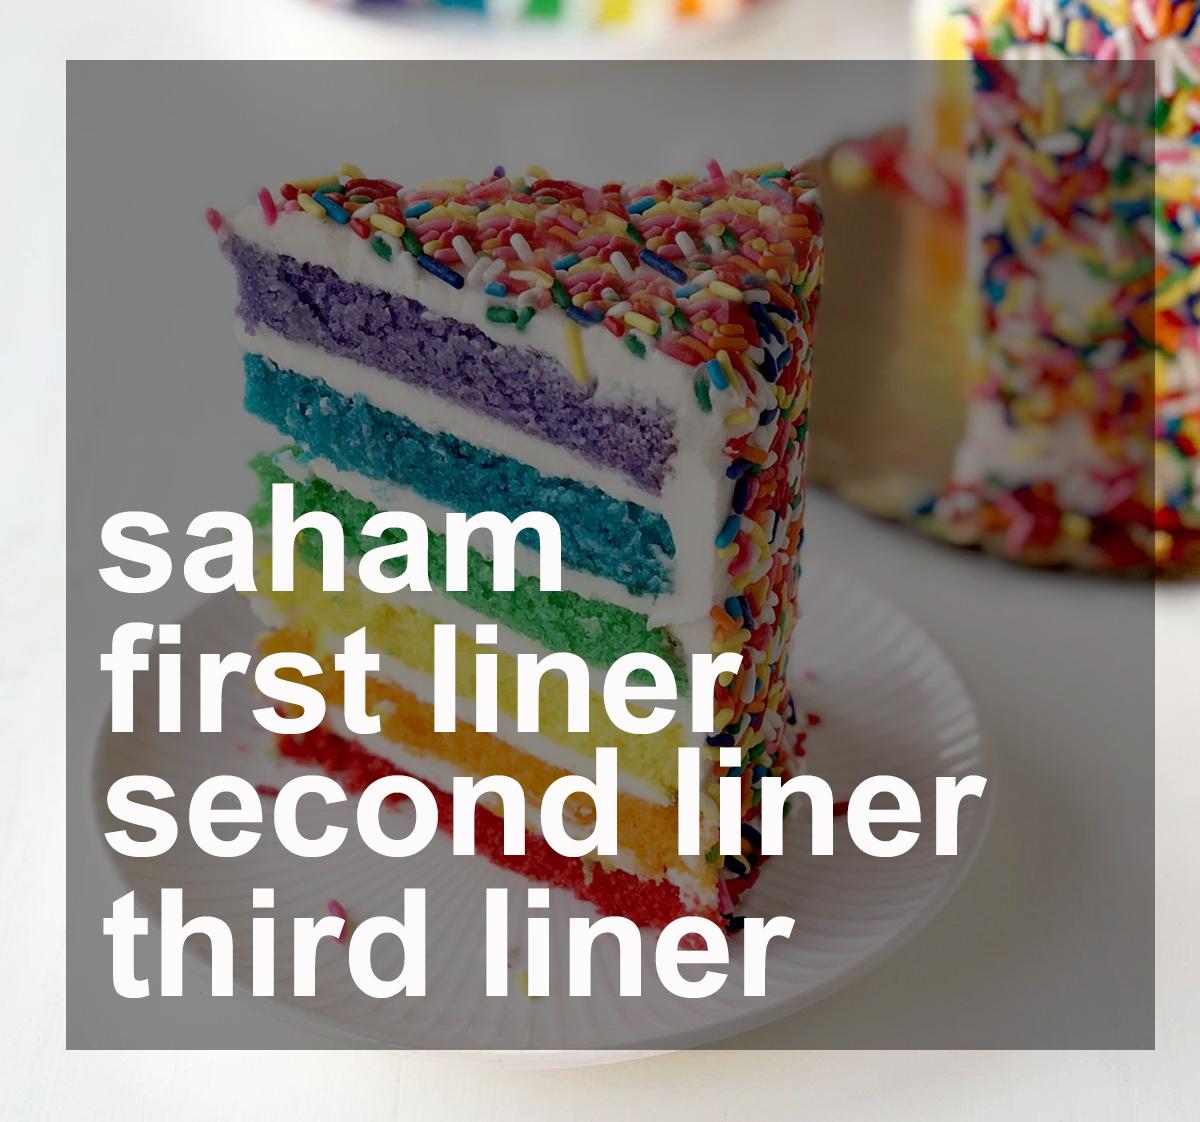 Mengenal saham First Liner, Second Liner dan Third Liner